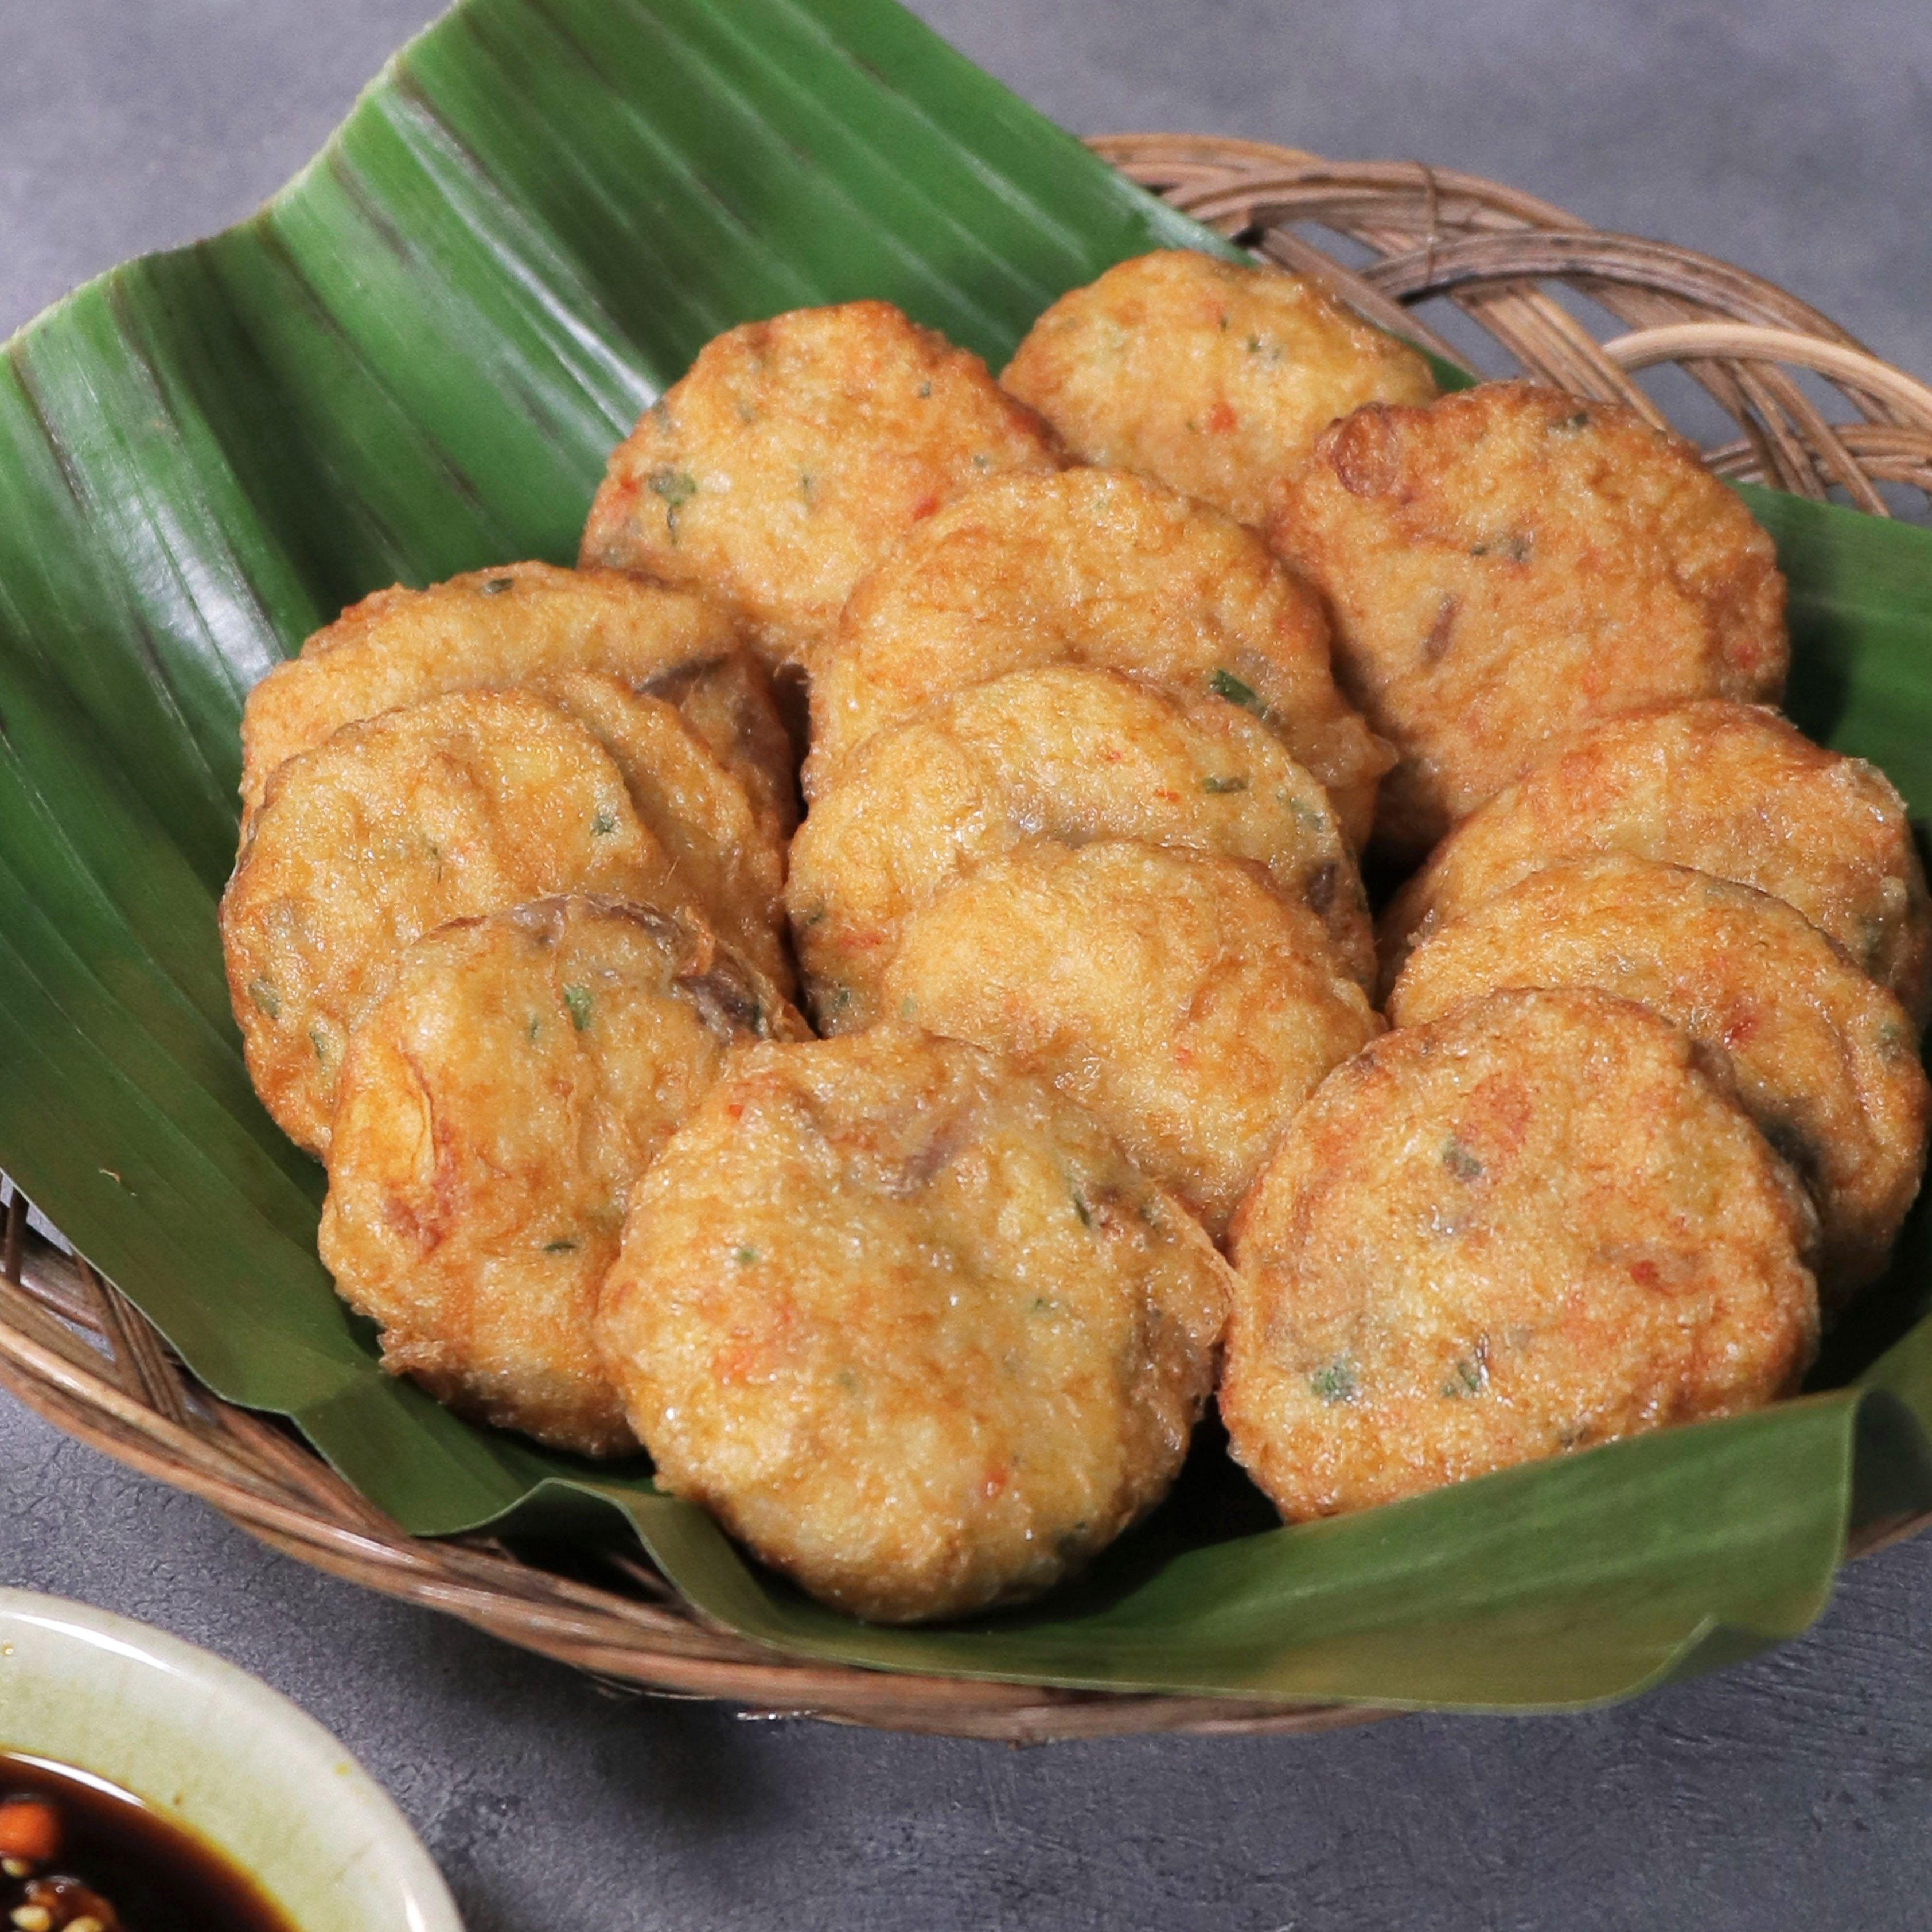 Resep Perkedel Kentang Udang Resep Makanan Kentang Resep Seafood